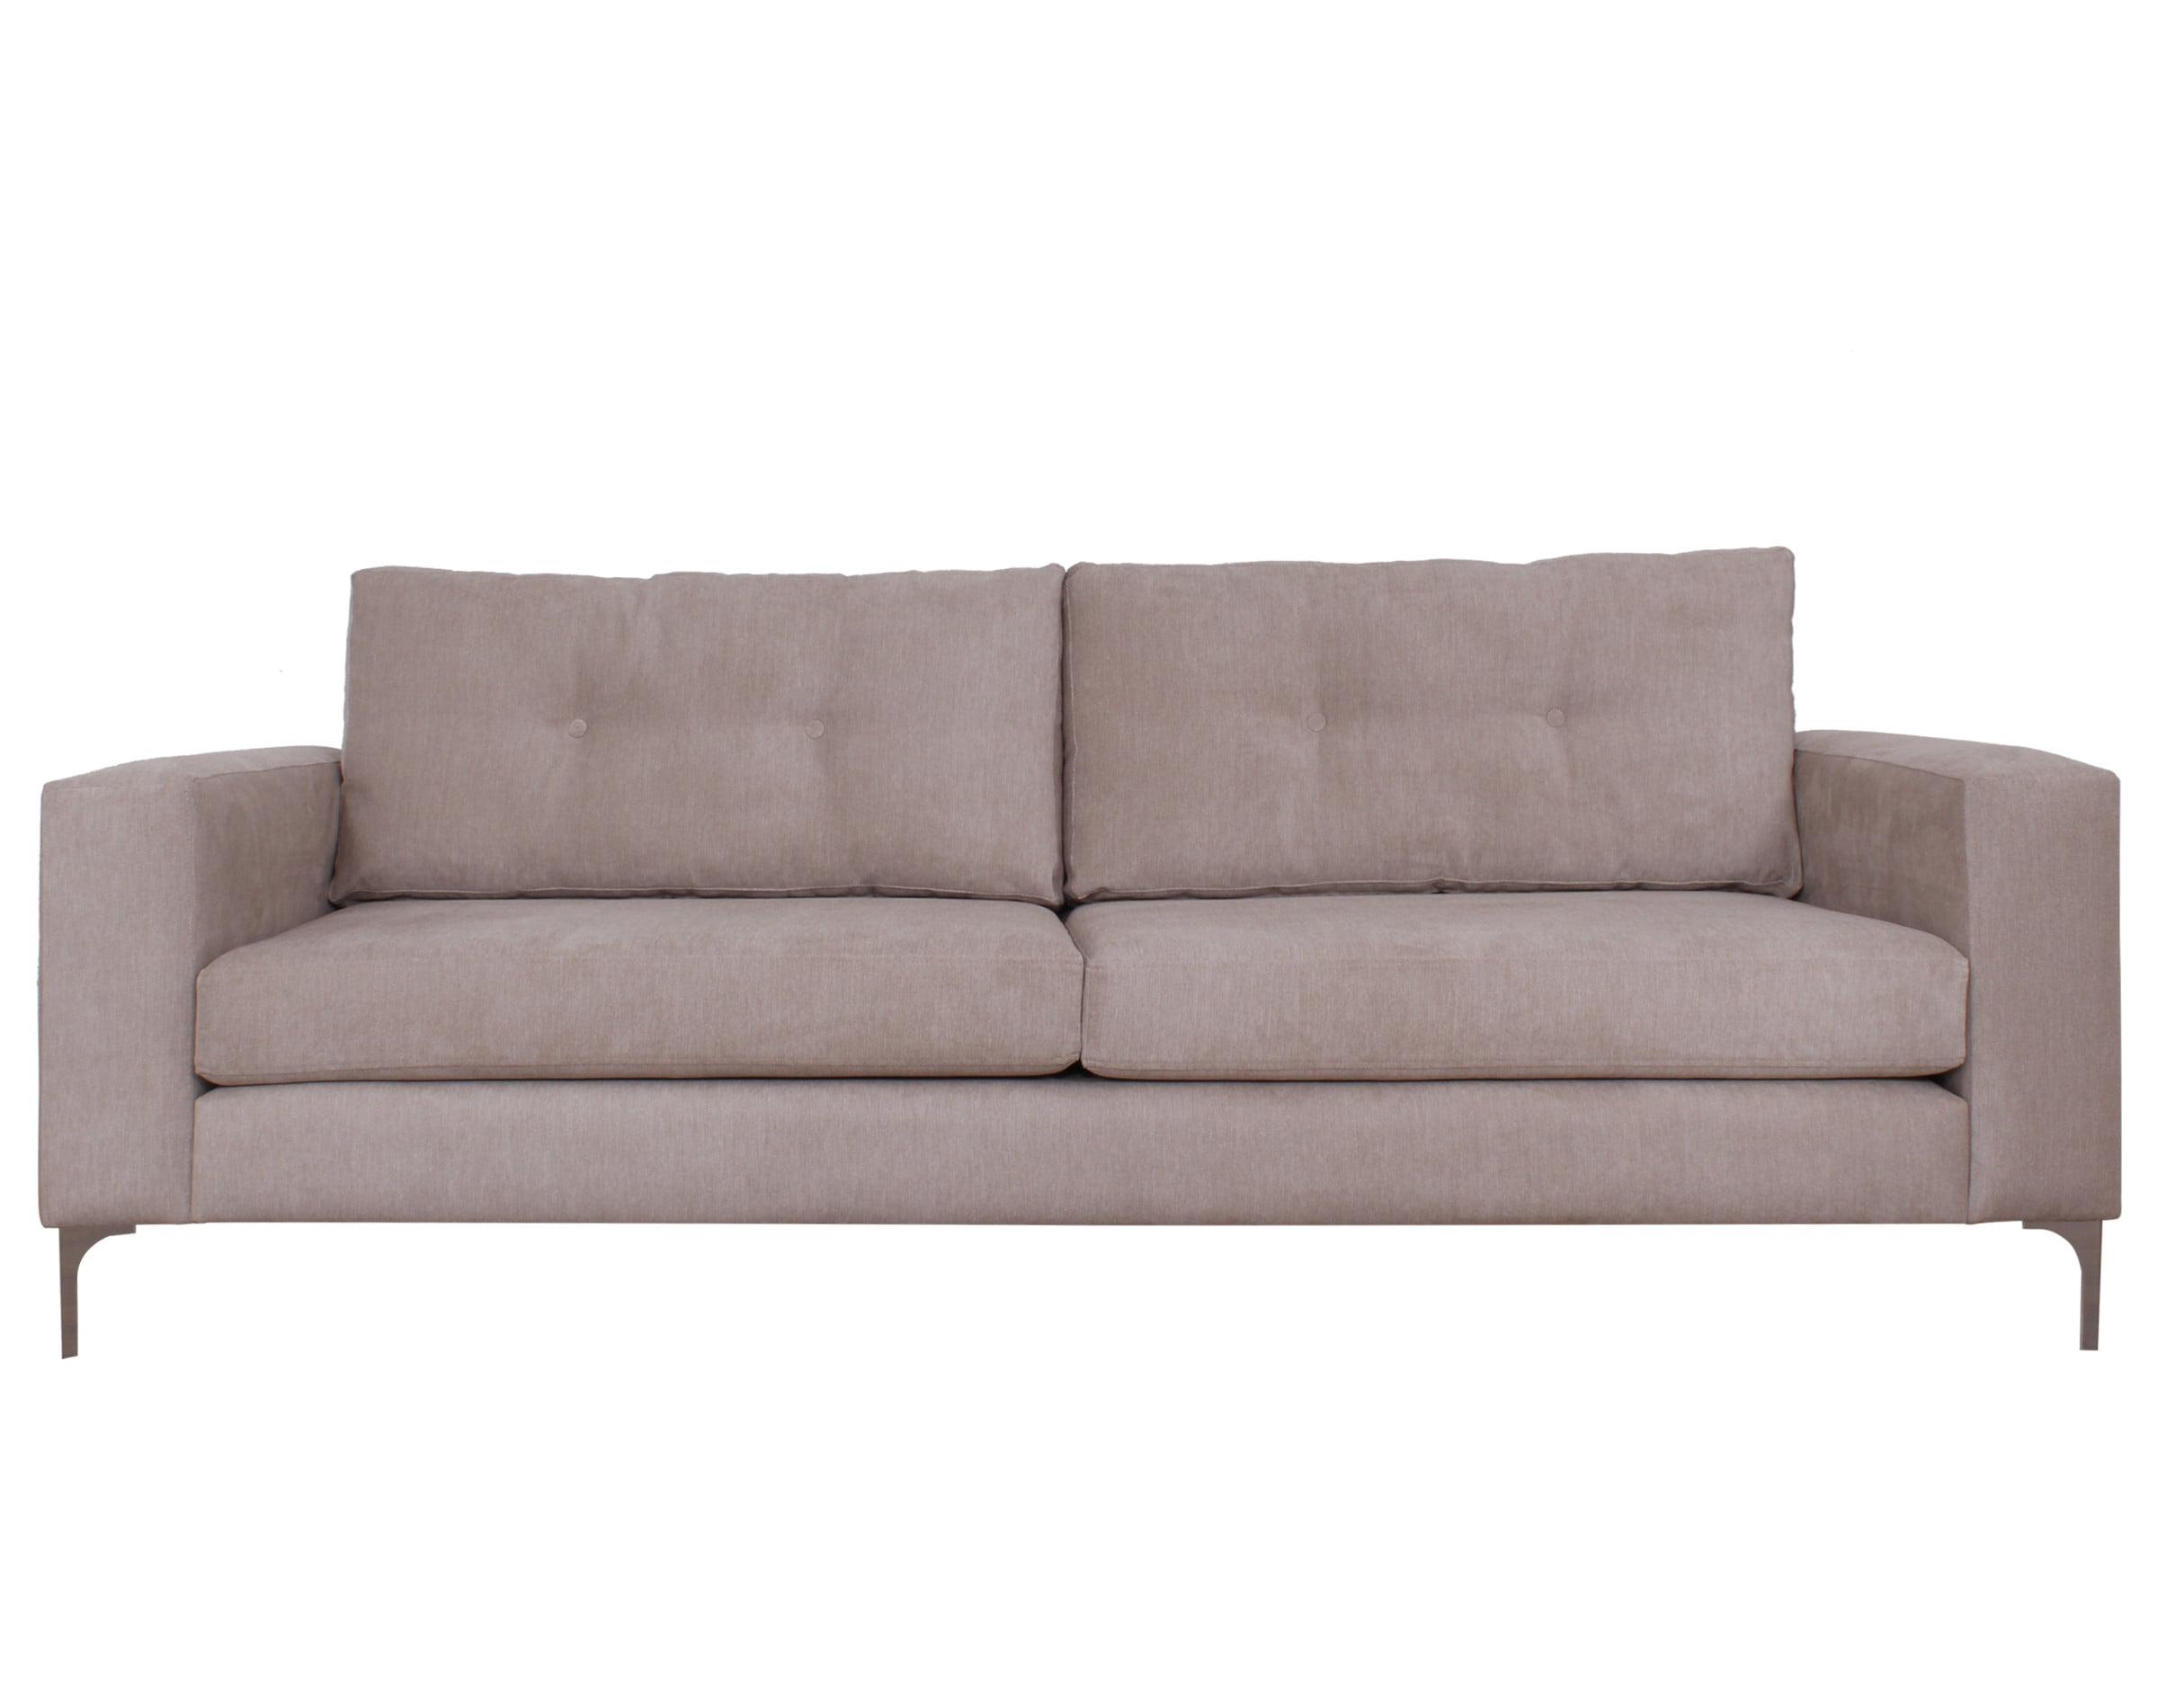 Sofa Especial Pana Beige 1